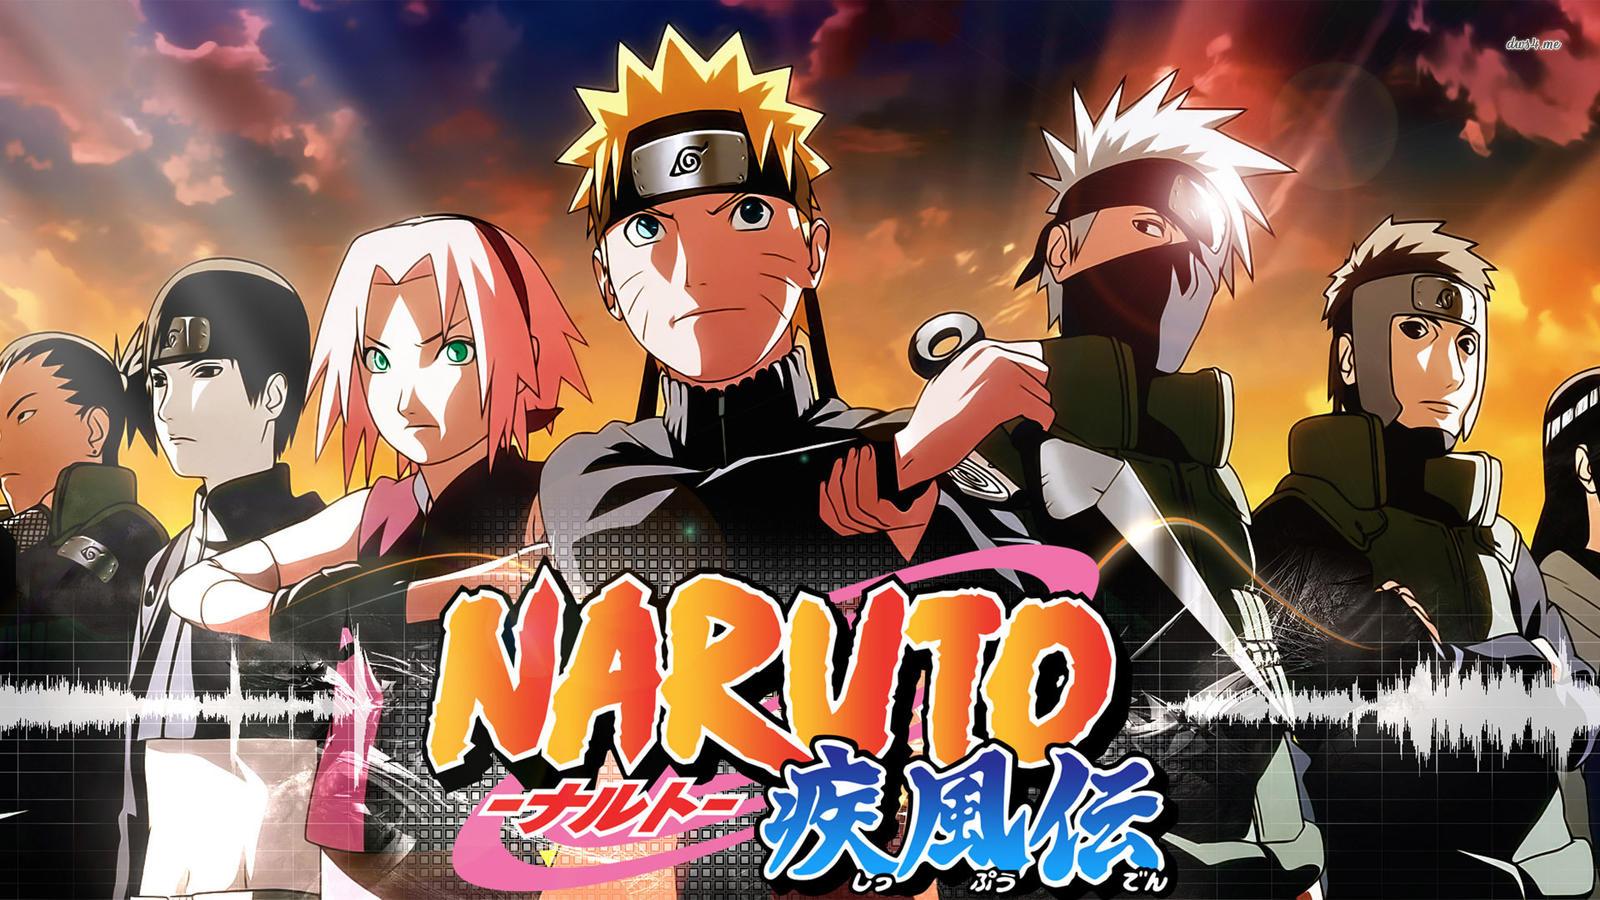 Fantastic Wallpaper Naruto Halloween - naruto_shippuden_anime_wallpaper_by_com90000-d881zai  Pictures_905960.jpg